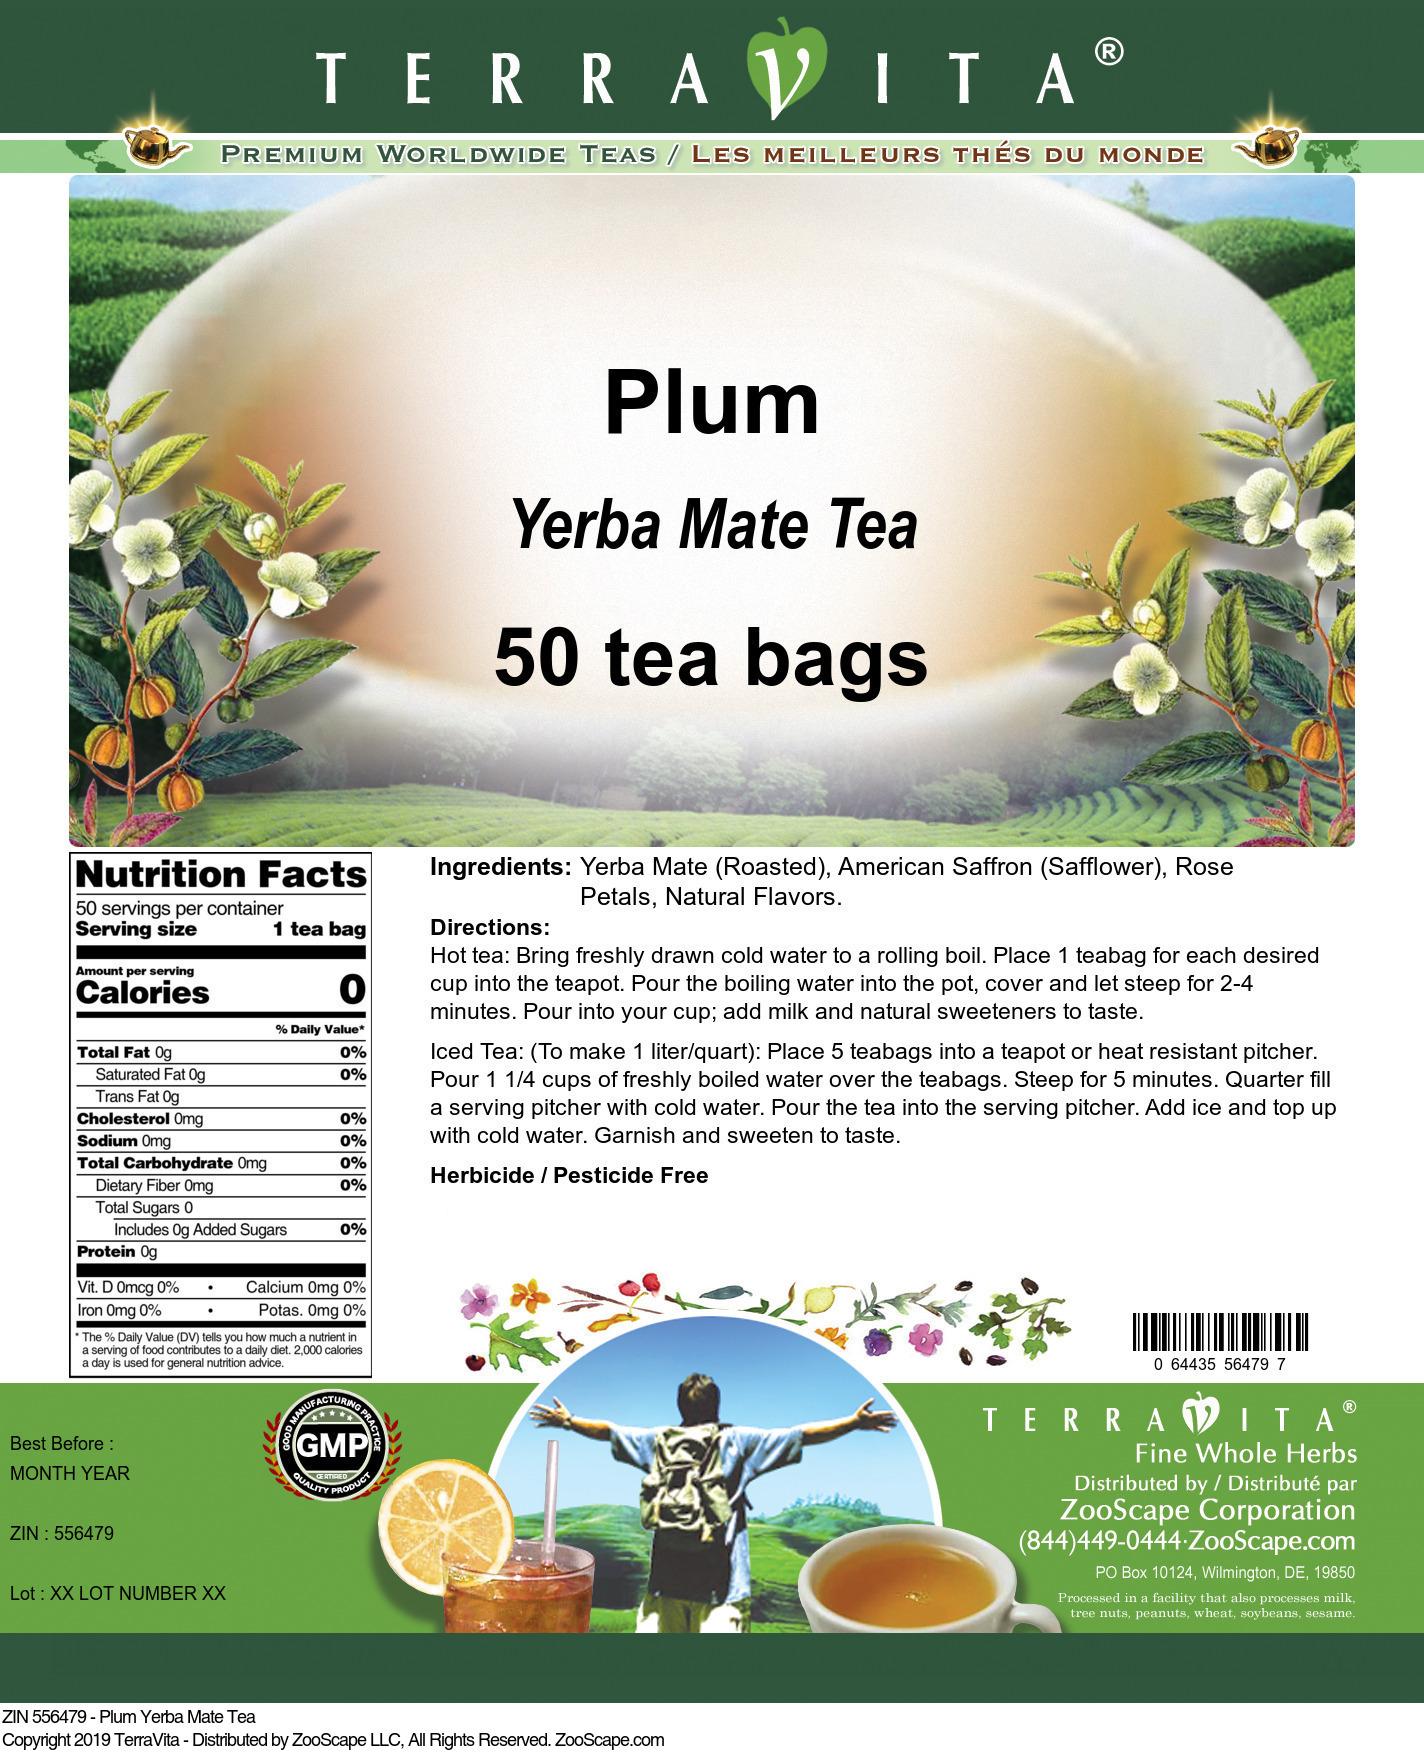 Plum Yerba Mate Tea